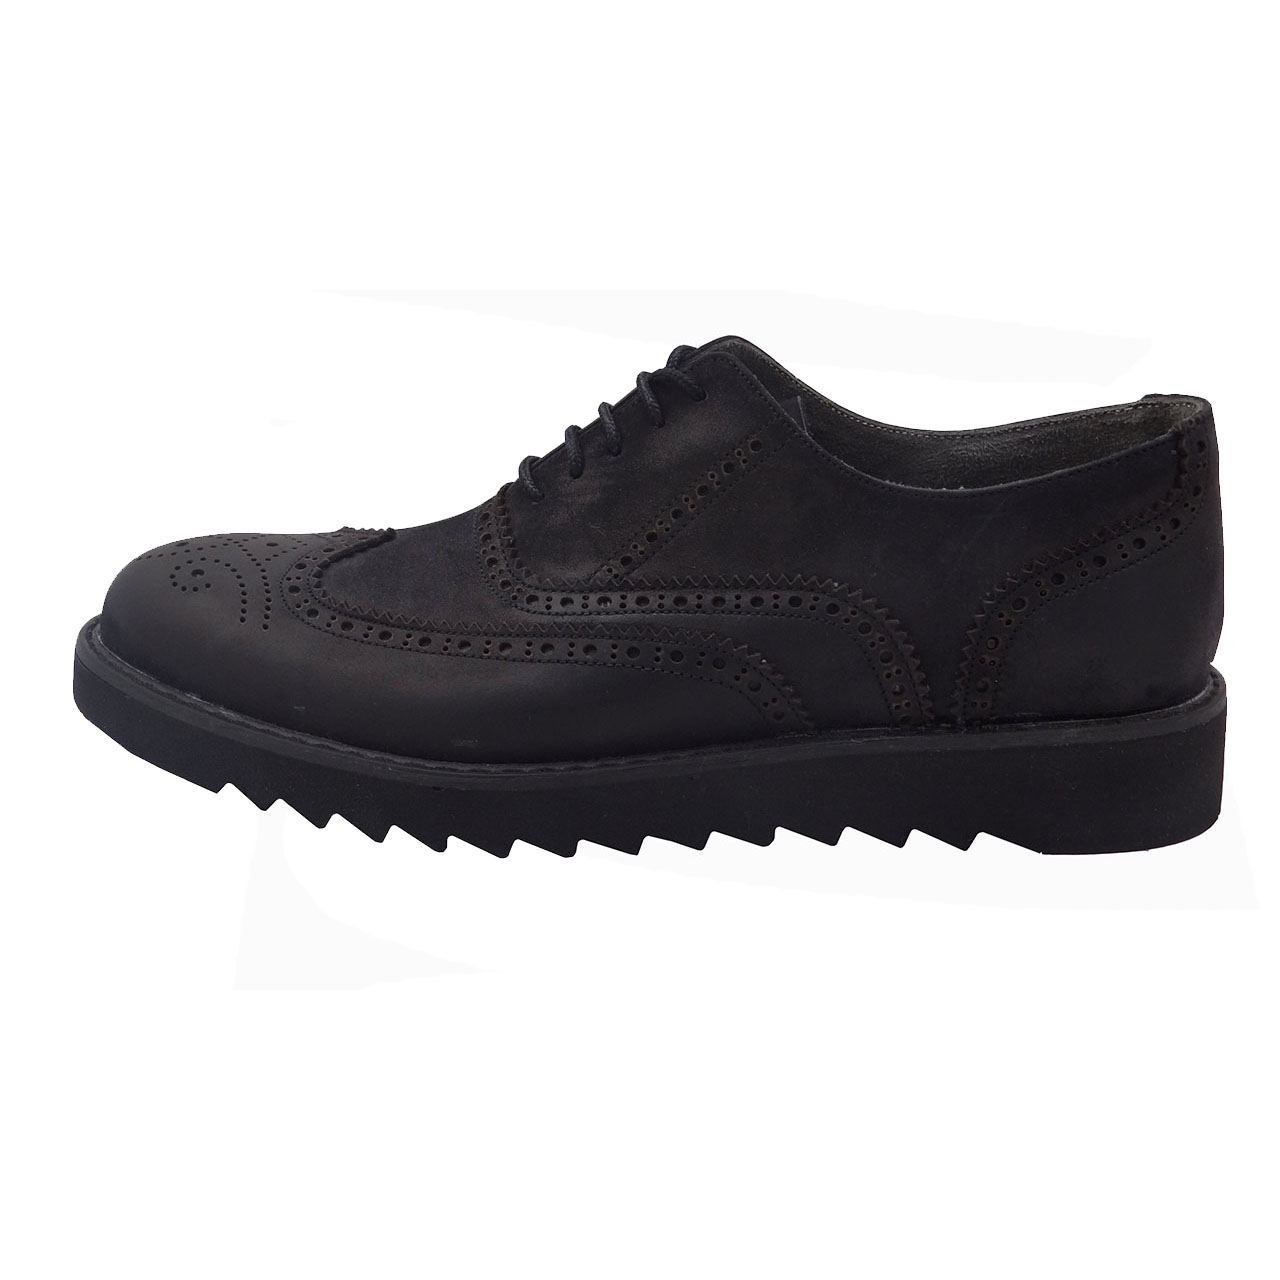 قیمت کفش  چرمی مردانه مدل هشترک کد B2